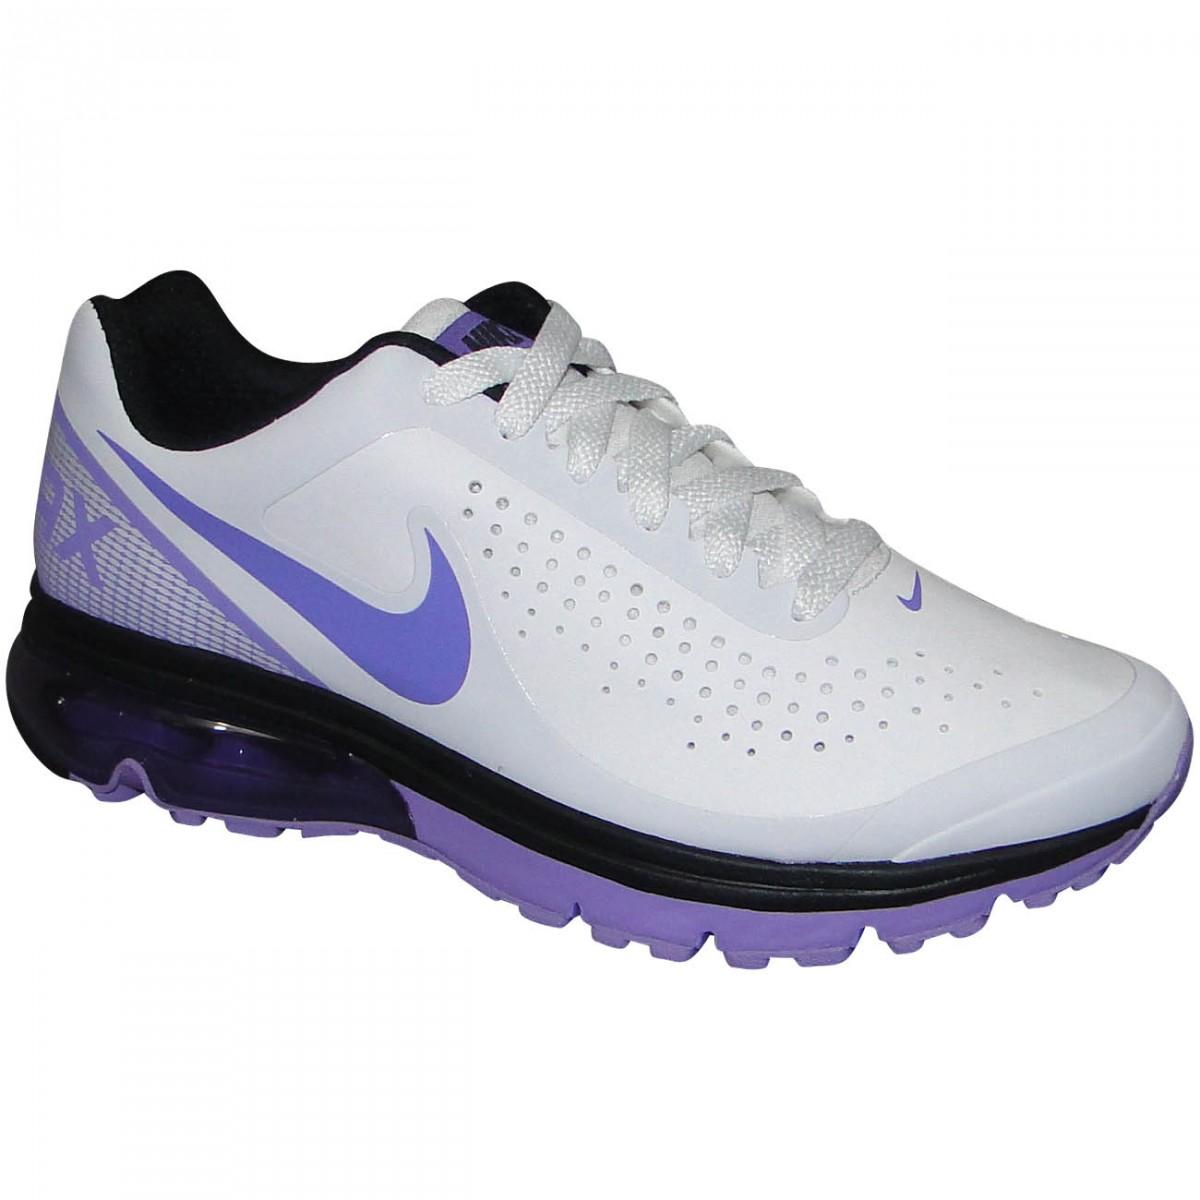 57092969378 Tenis Nike Air Max Supreme 2 633061 100 - Branco Lilas - Chuteira ...